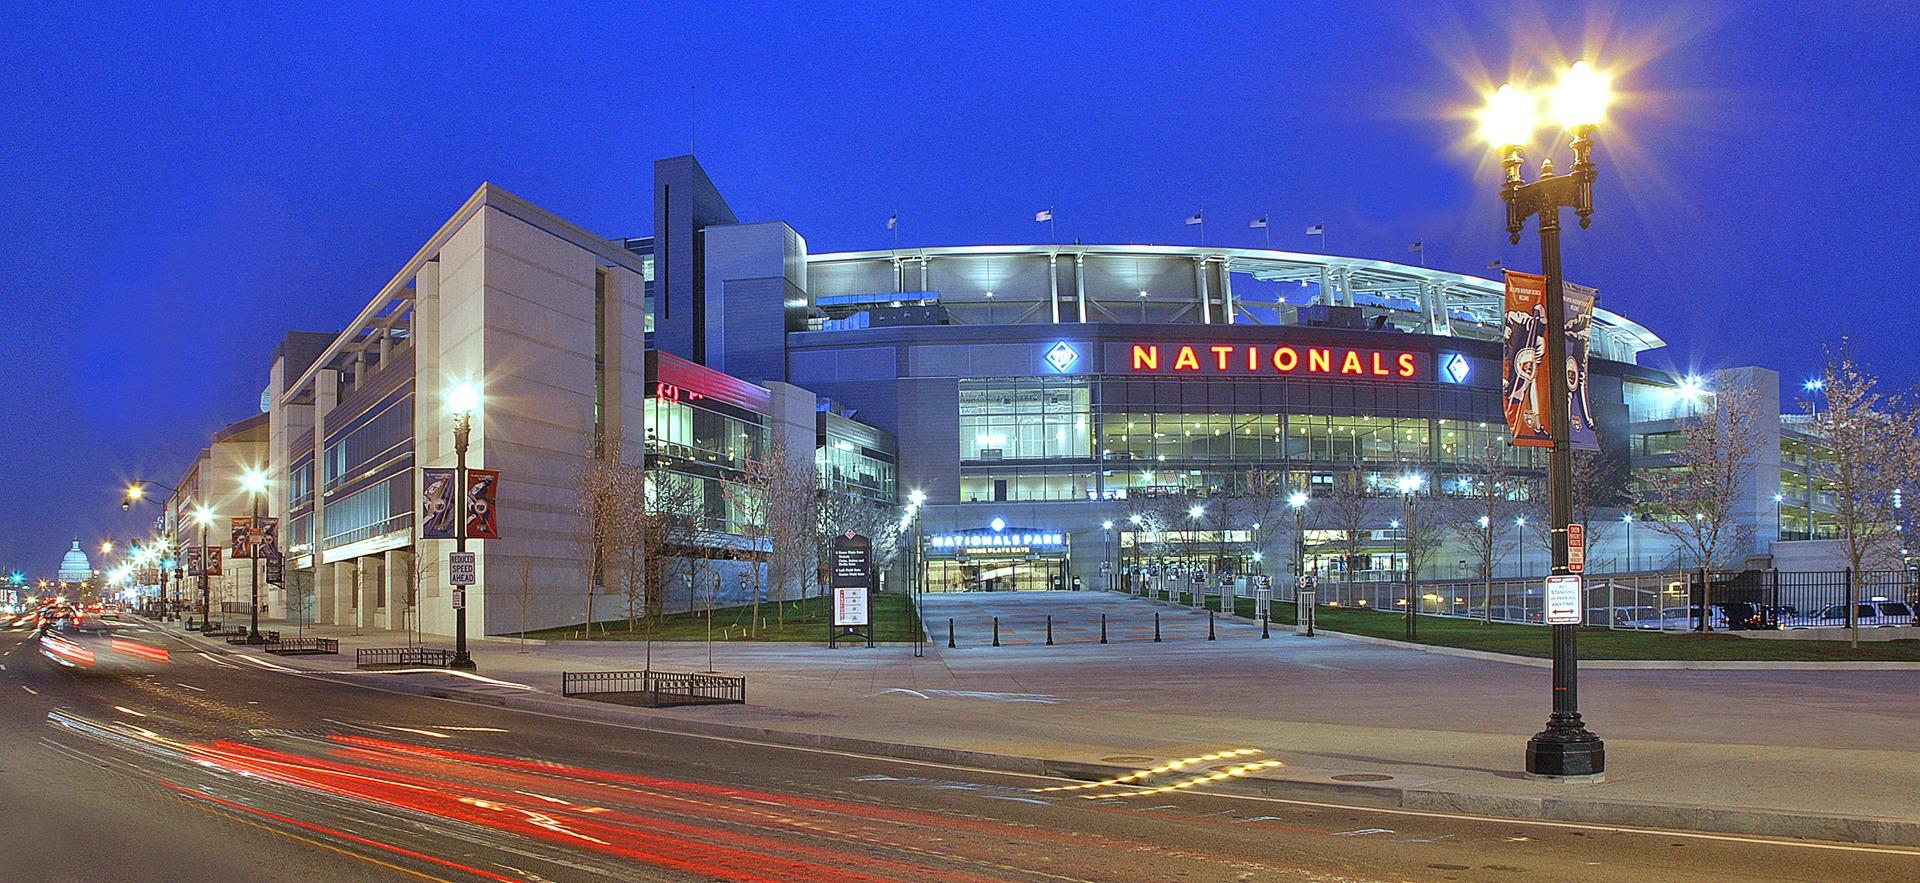 Washington Nationals Baseball Park, Washington, DC